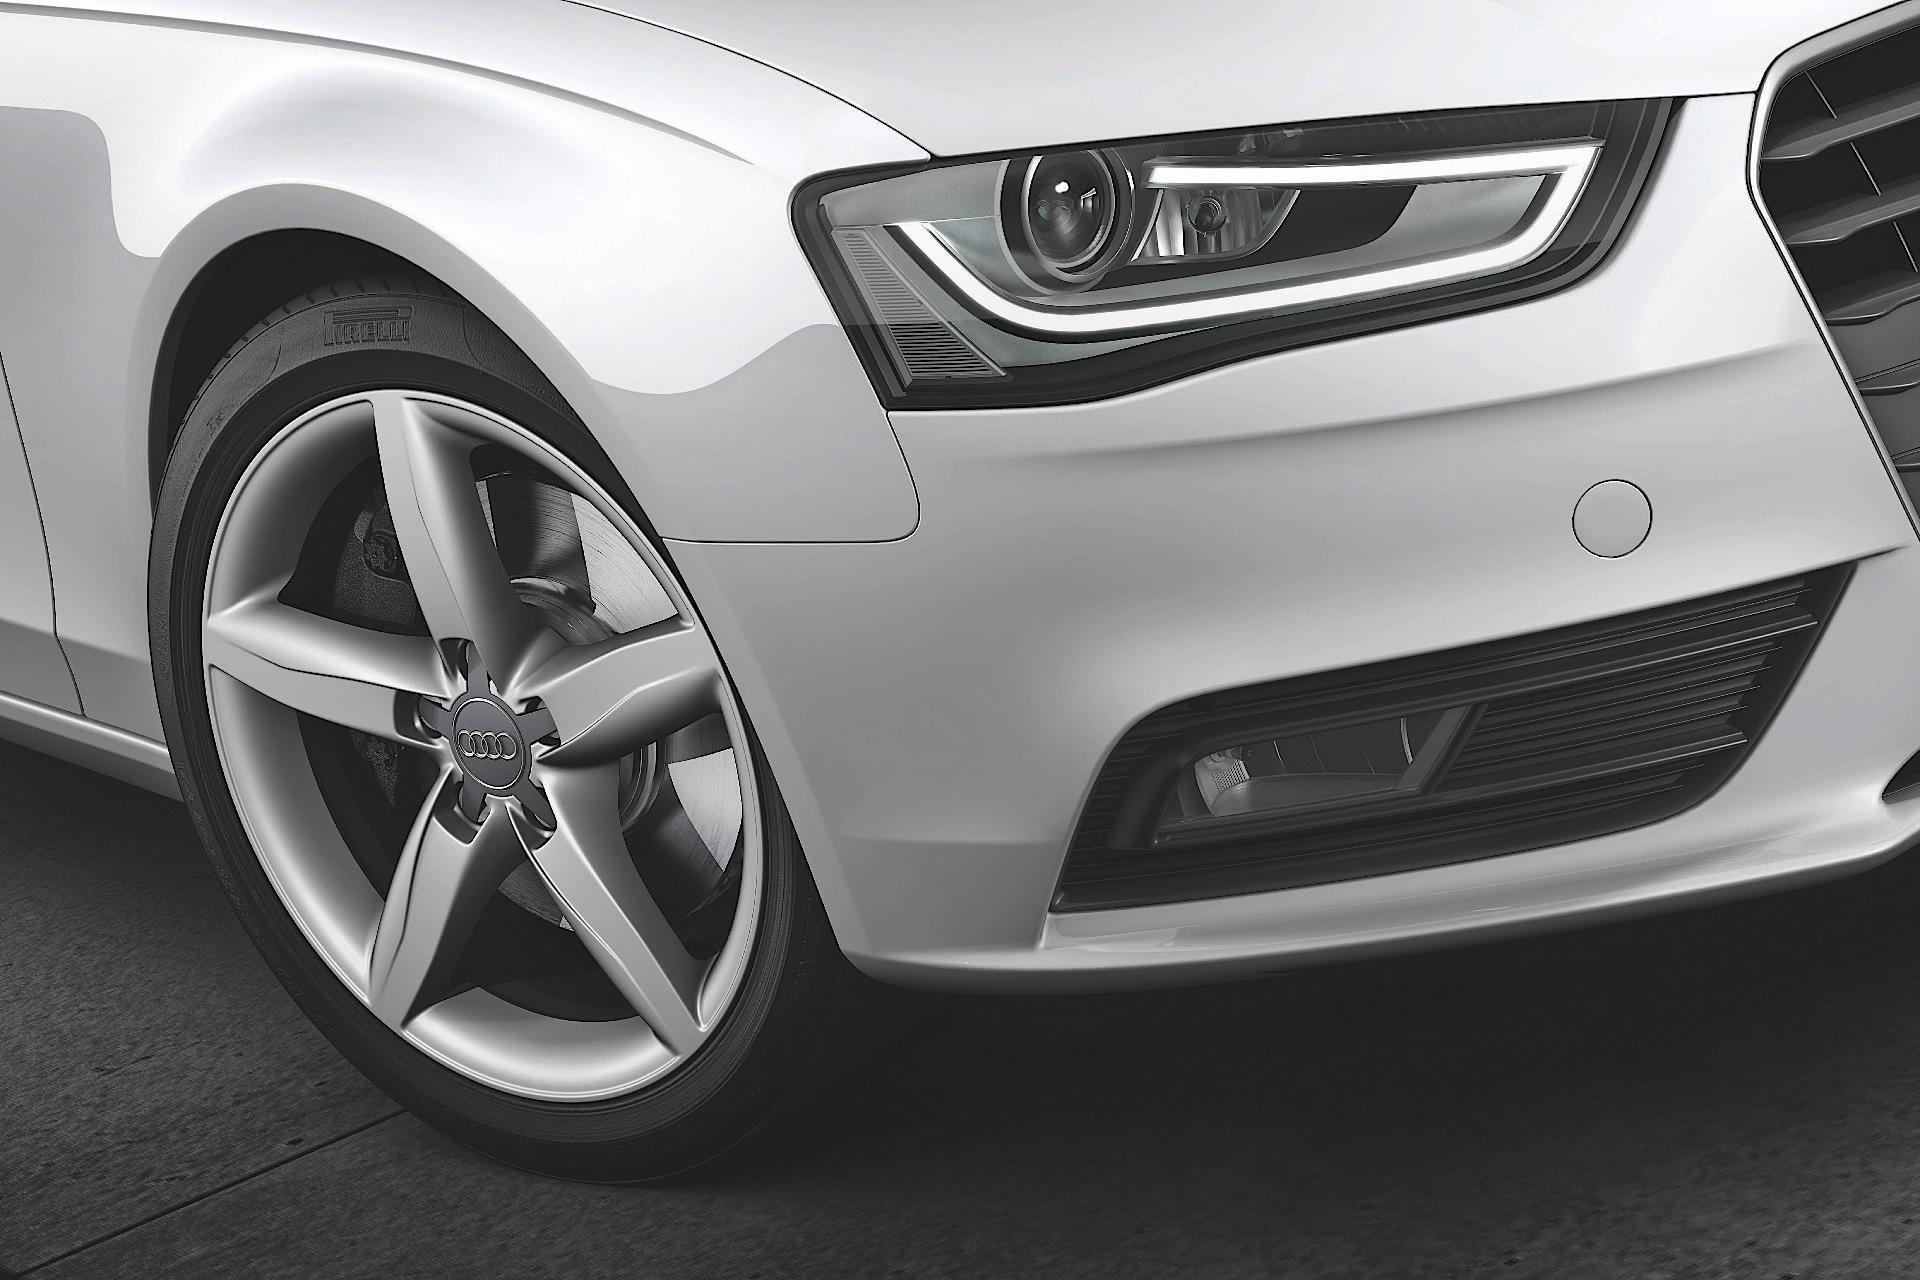 Audi A4 2016 Exterior Front Vire